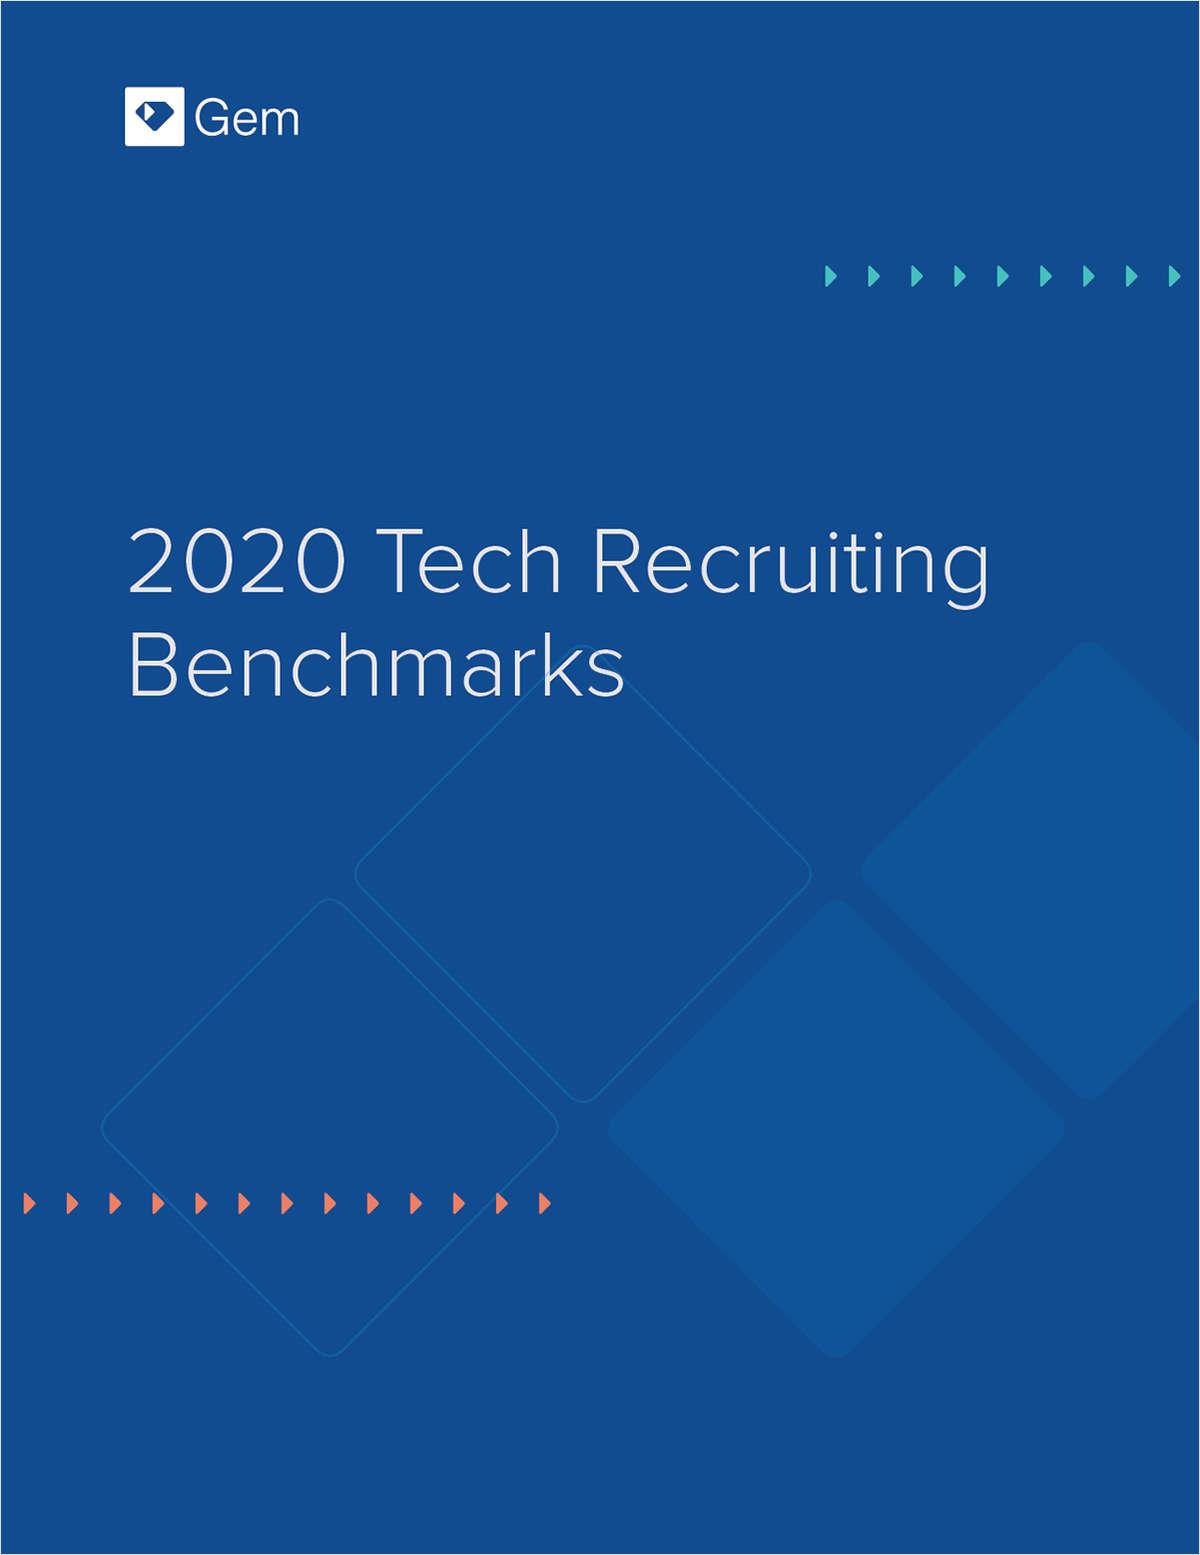 Diversity Recruiting 101: How to Source & Nurture Underrepresented Talent